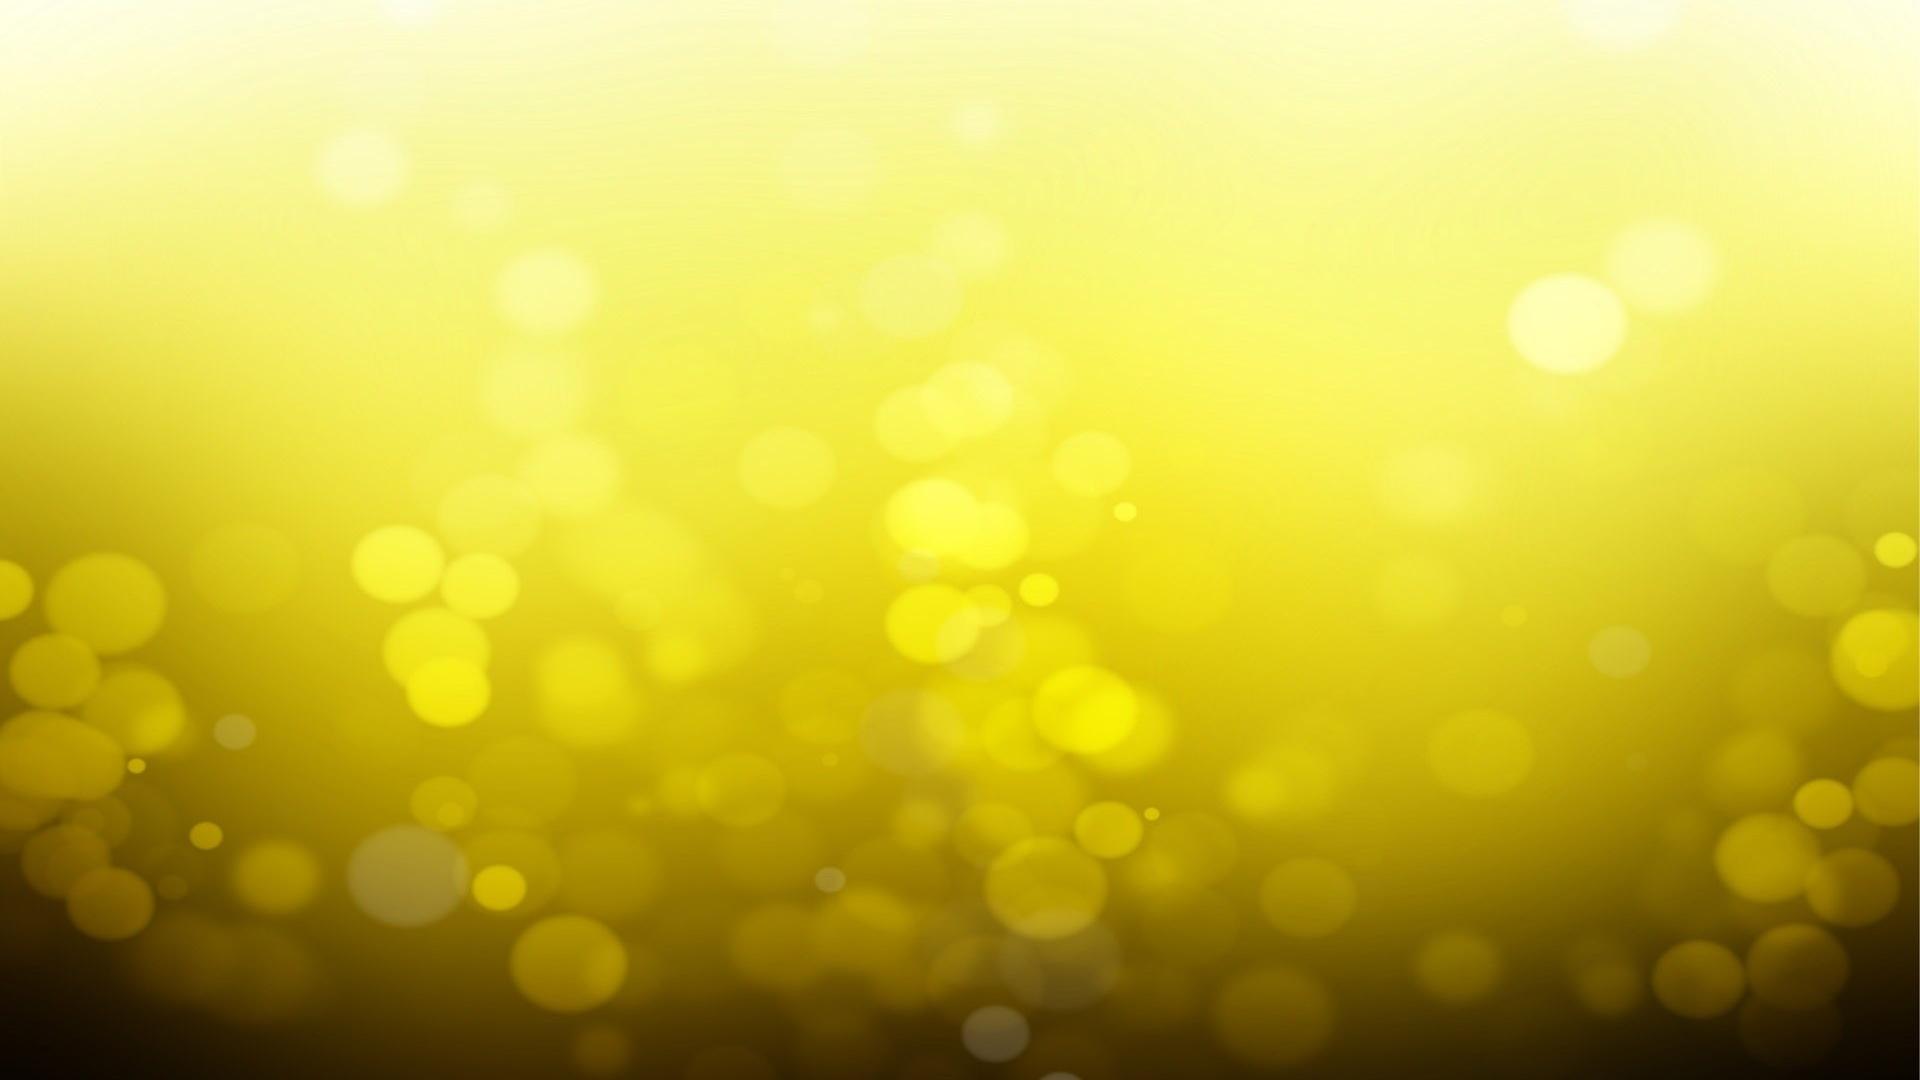 Yellow wallapaper 18